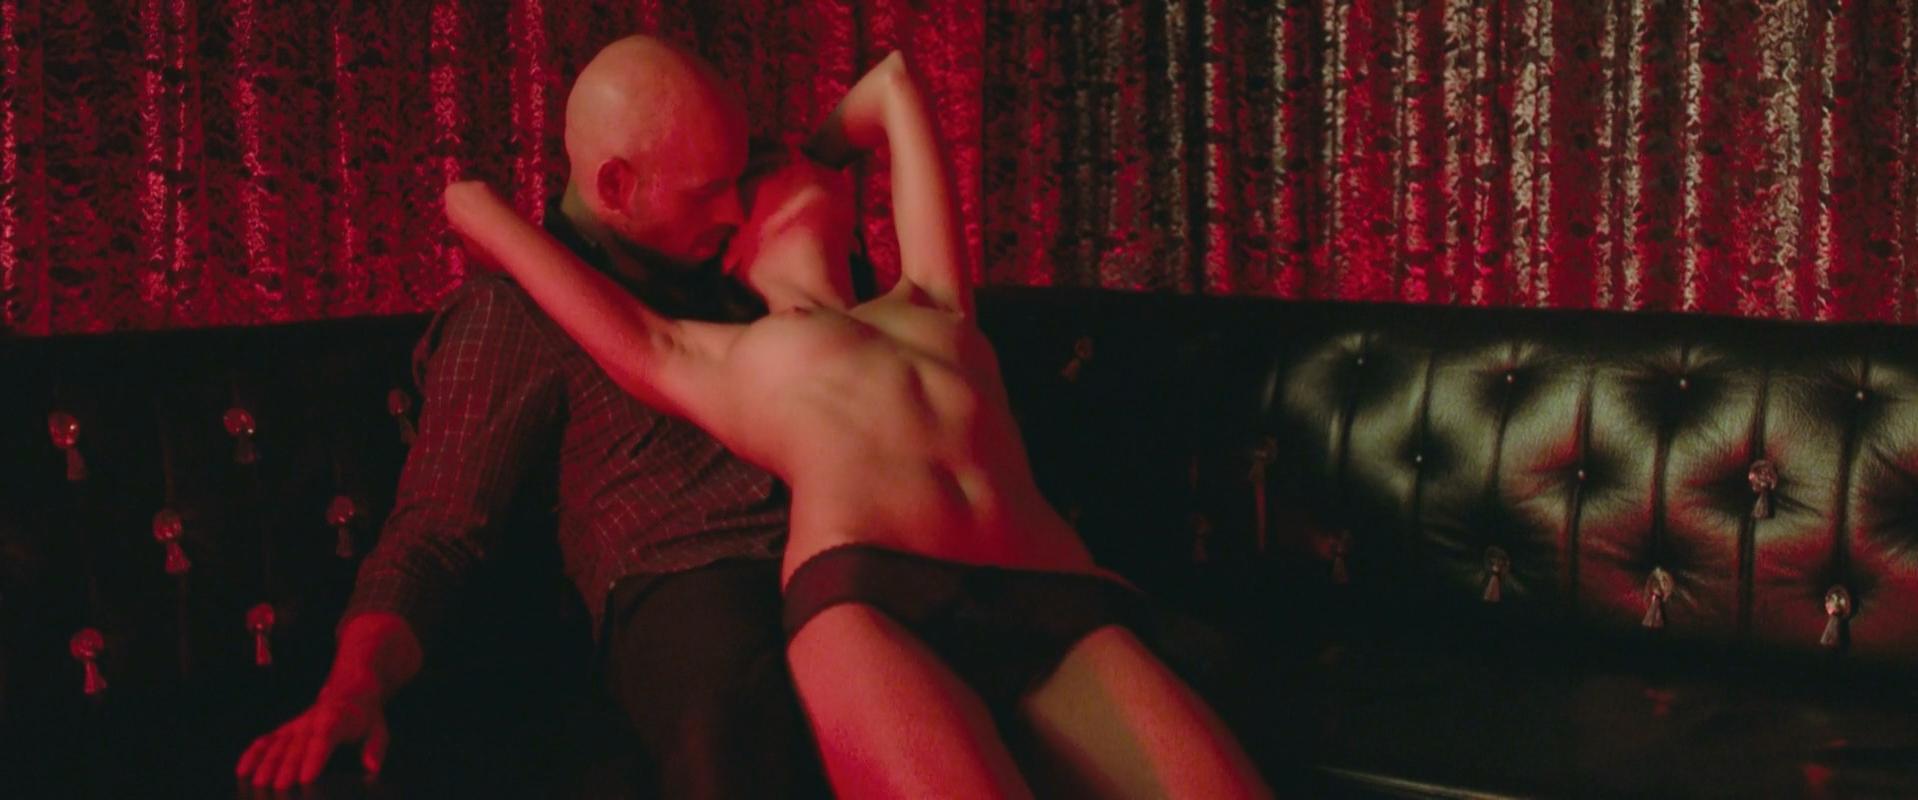 Mary-Lou Hermant nude, Mercedes Aspa Le Thi nude, Emilie Arthapignet nude - Toute premiere fois (2015)